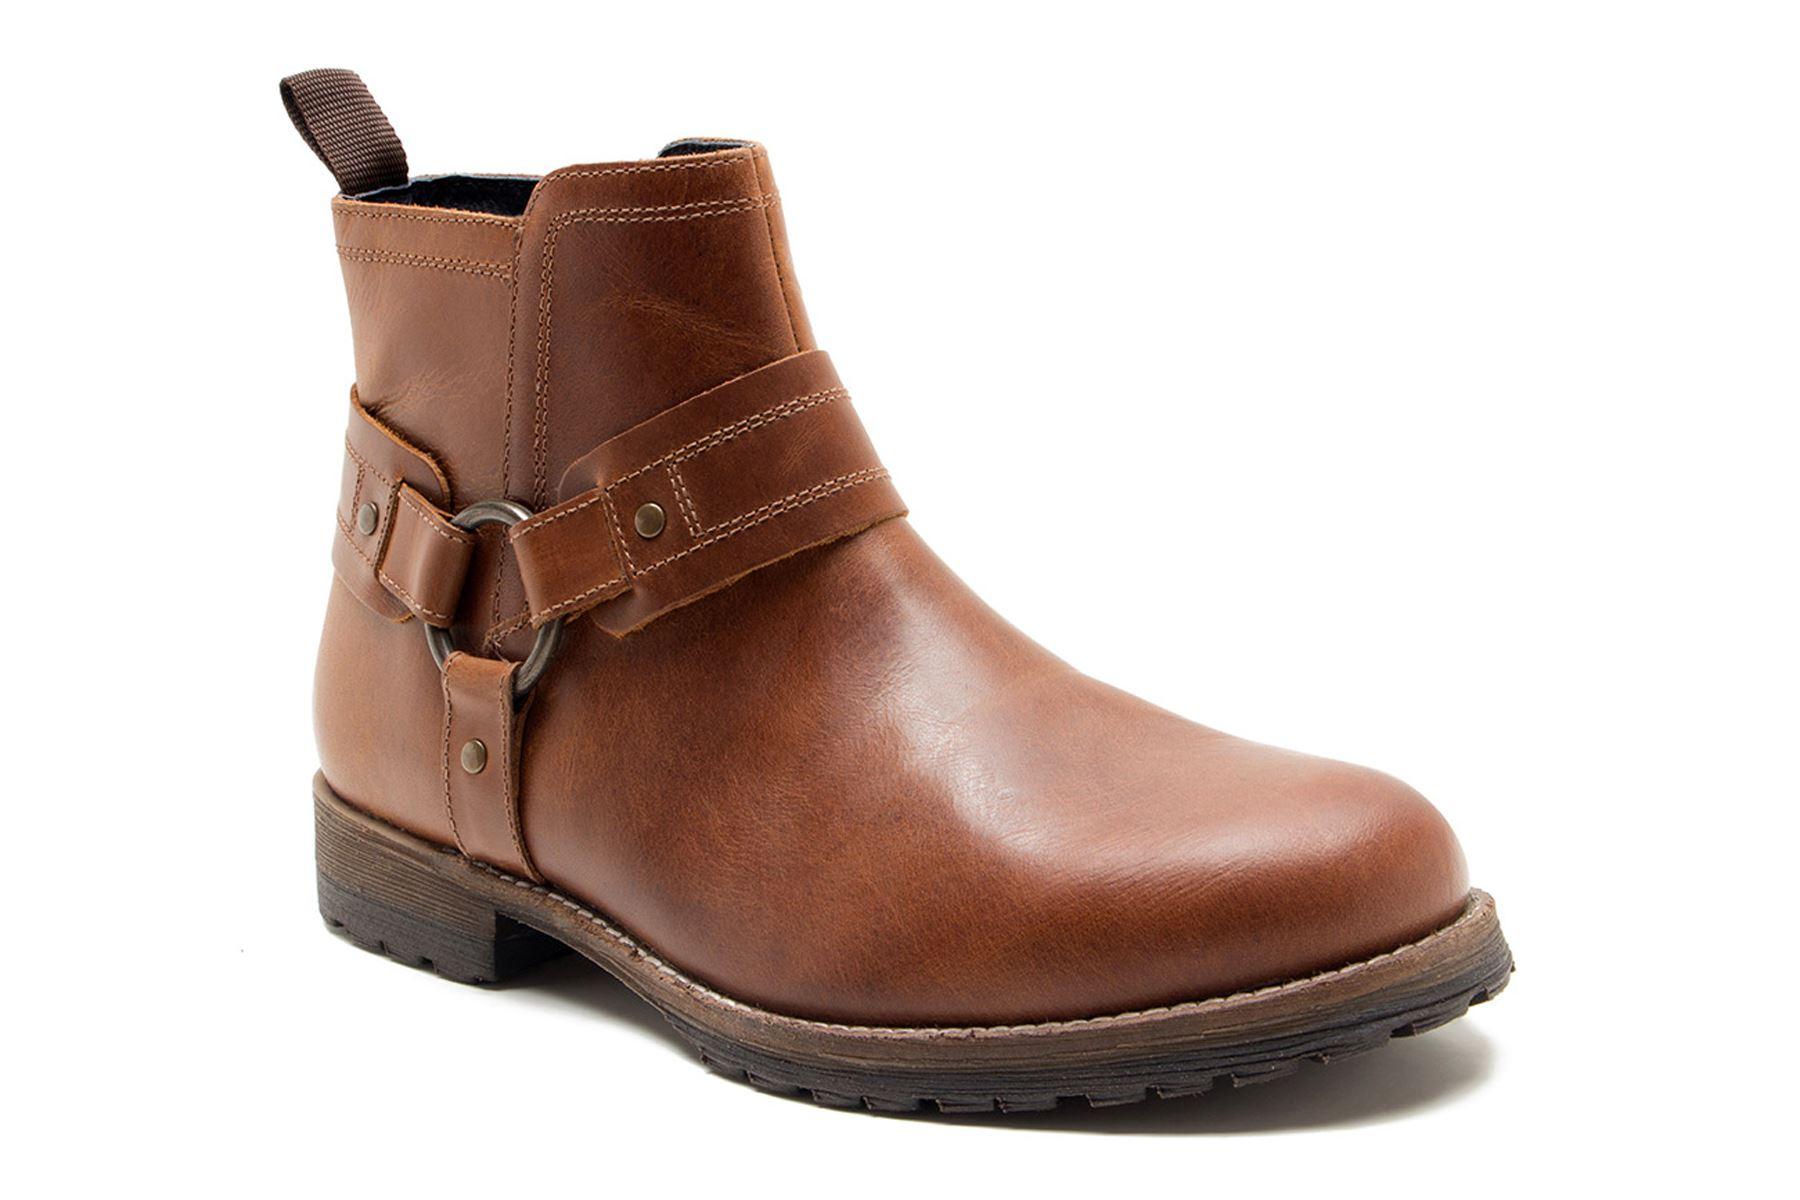 f250ab6c4b8d Details about Red Tape Bradley Biker Cowboy Weston Ankle Zip Strap Boots  Tan Brown